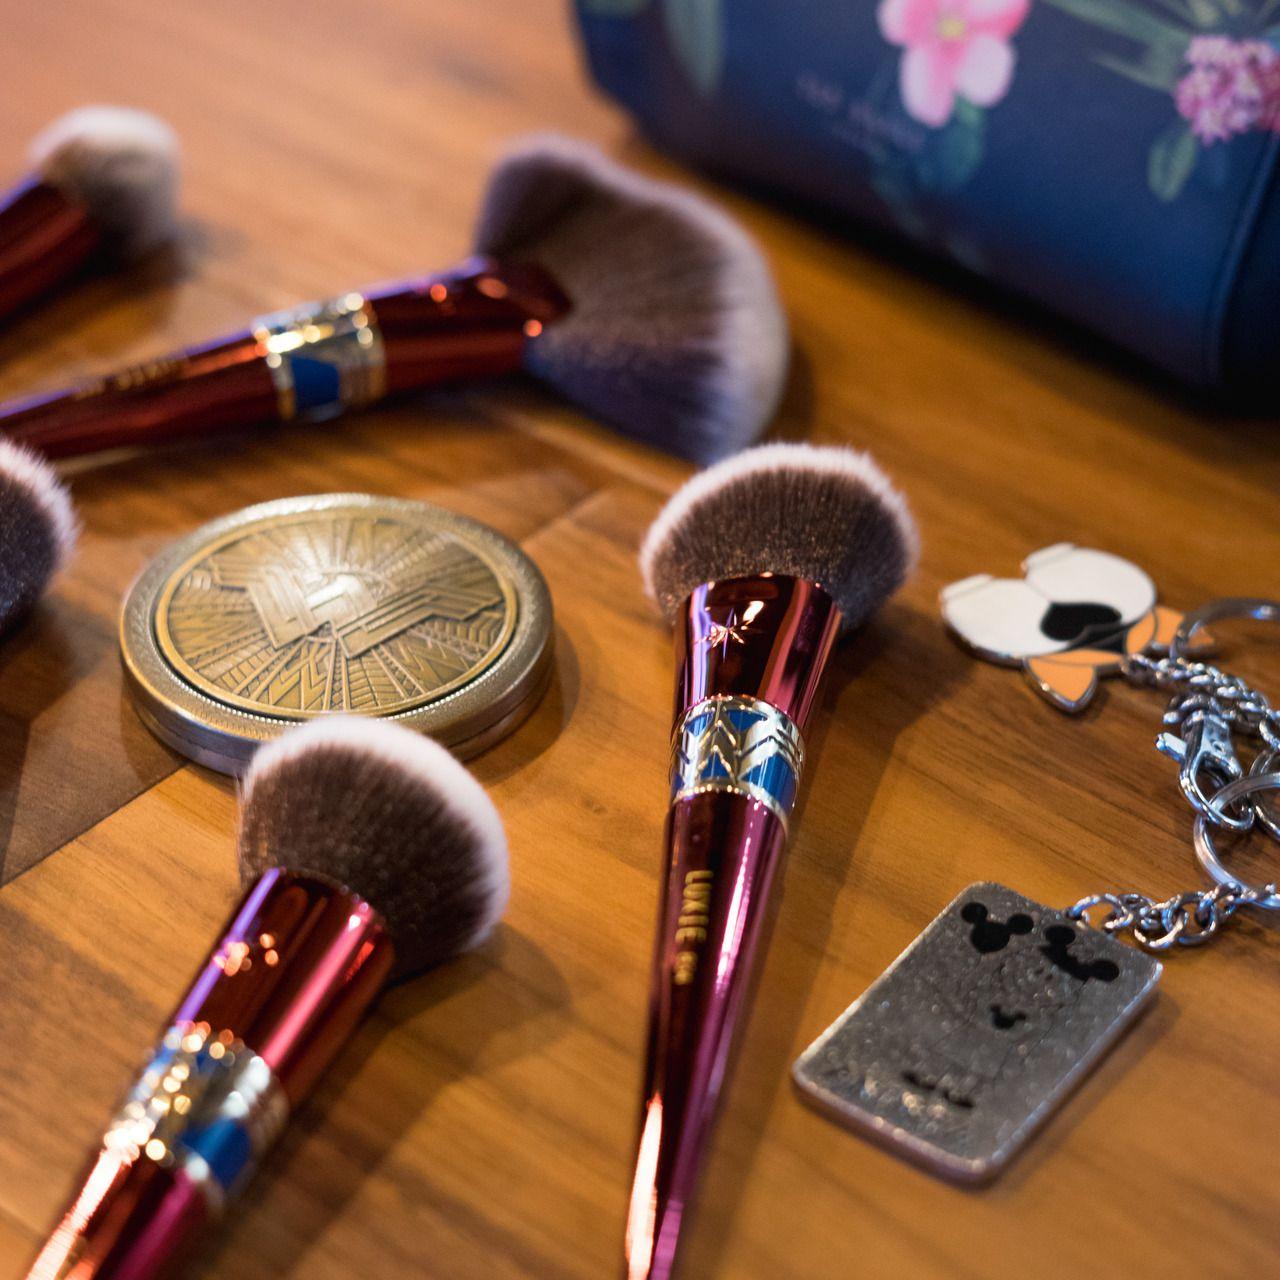 Luxie's Wonder Woman makeup brush collection Wonder